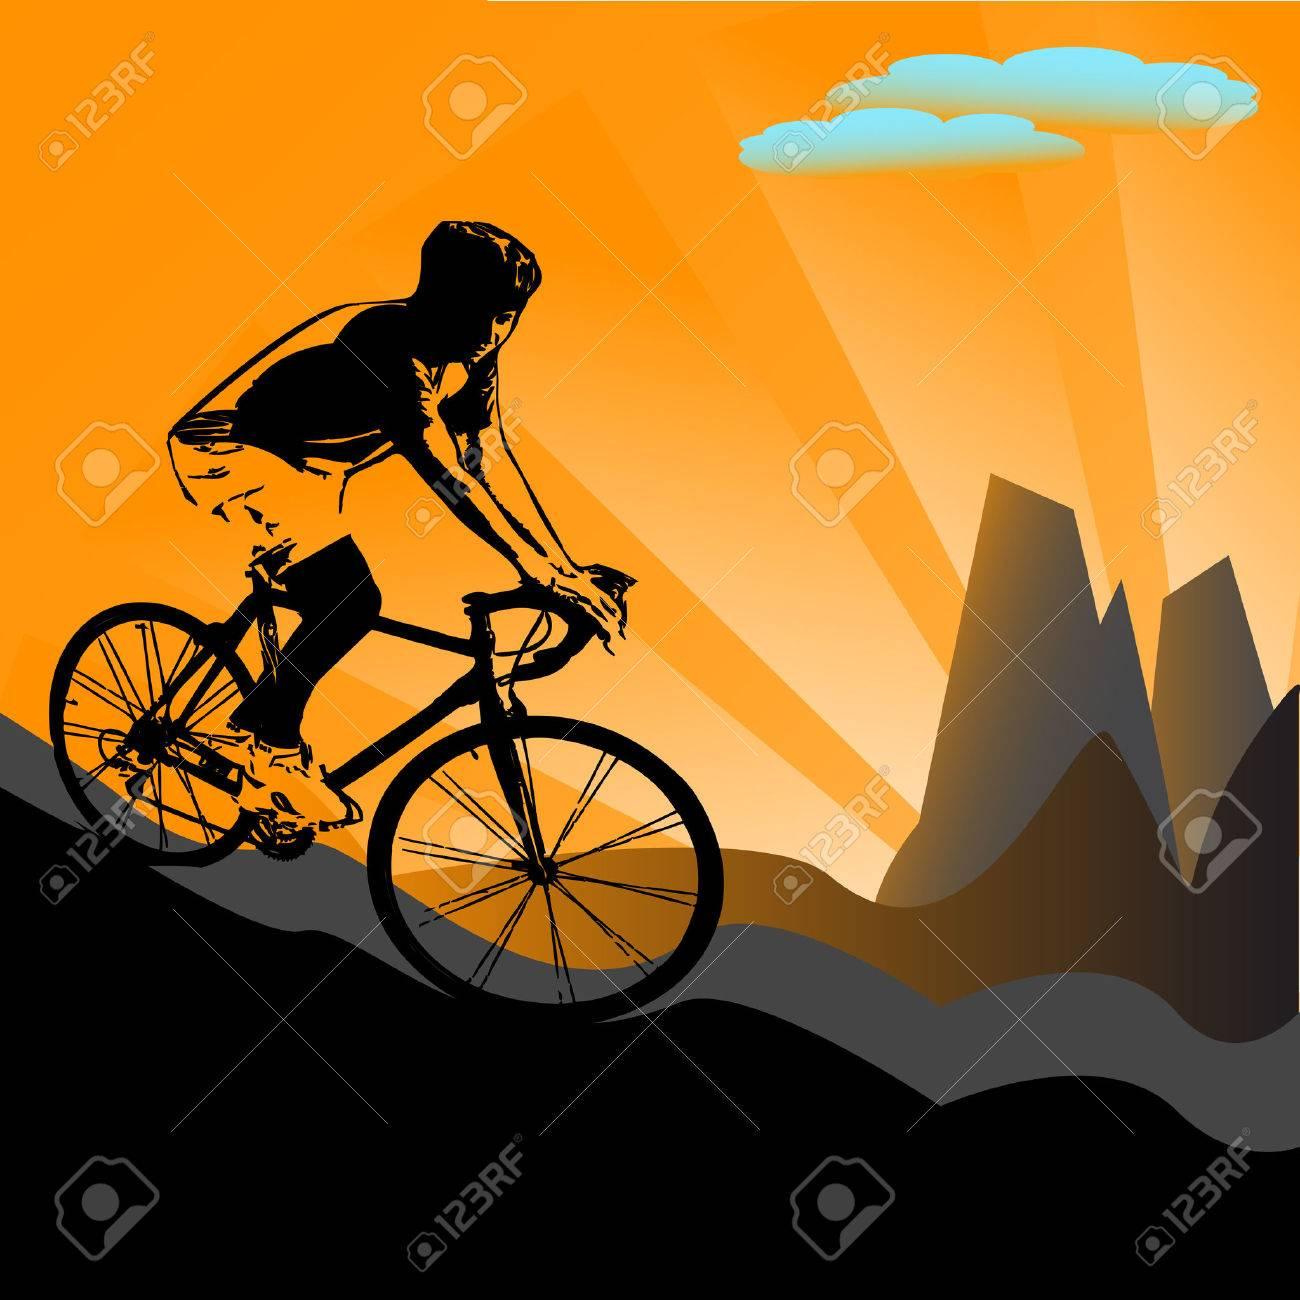 vector illustration of biker silhouette on sunny, mountain background - 5737083